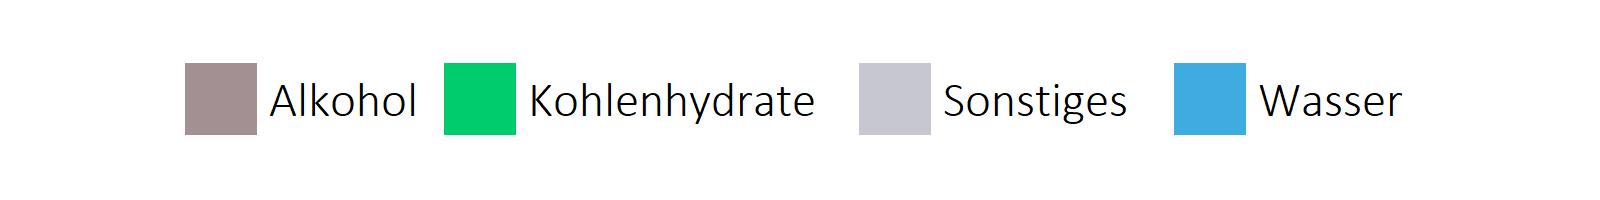 alkoholhaltige Getränke Produktelemente horizontale Legende